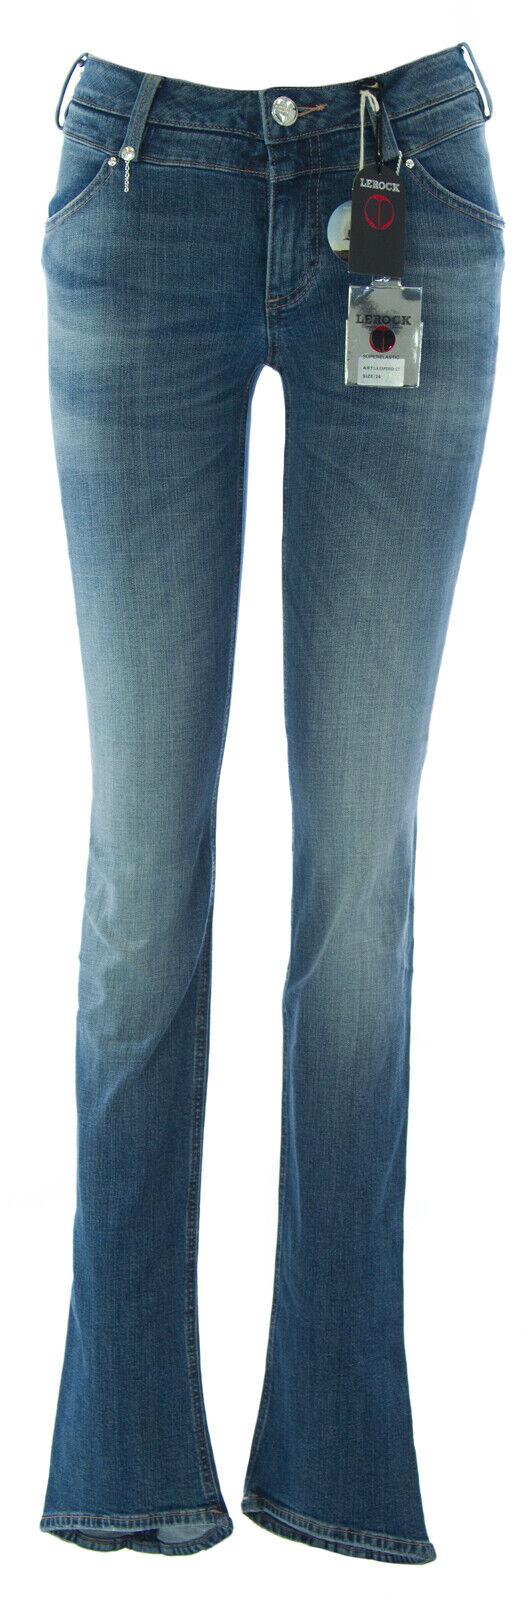 Lerock Donna Blu Medio Slavato Slim Fit Gamba Dritta Denim Denim Denim Jeans 71bfae